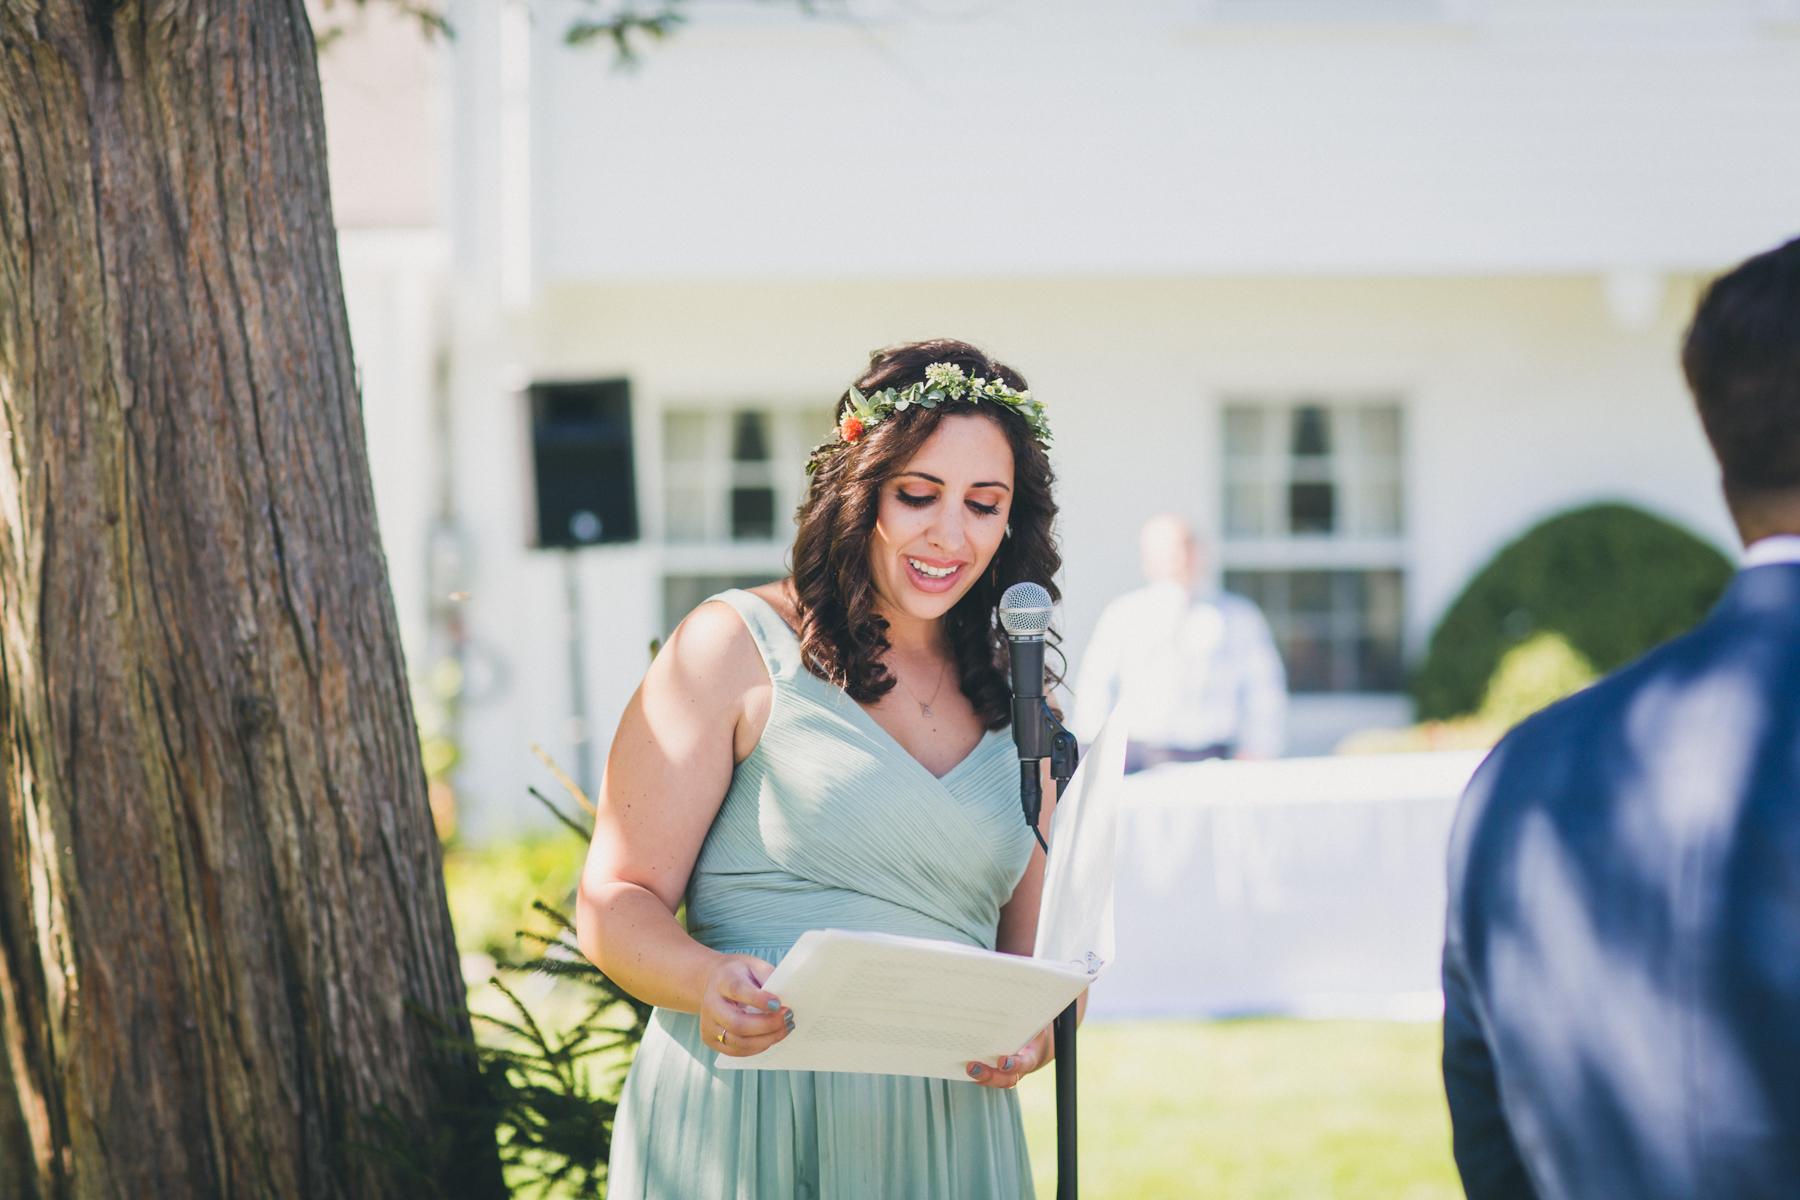 Long-Island-Documentary-Wedding-Photography-Summer-Tent-Wedding-in-New-York-61.jpg